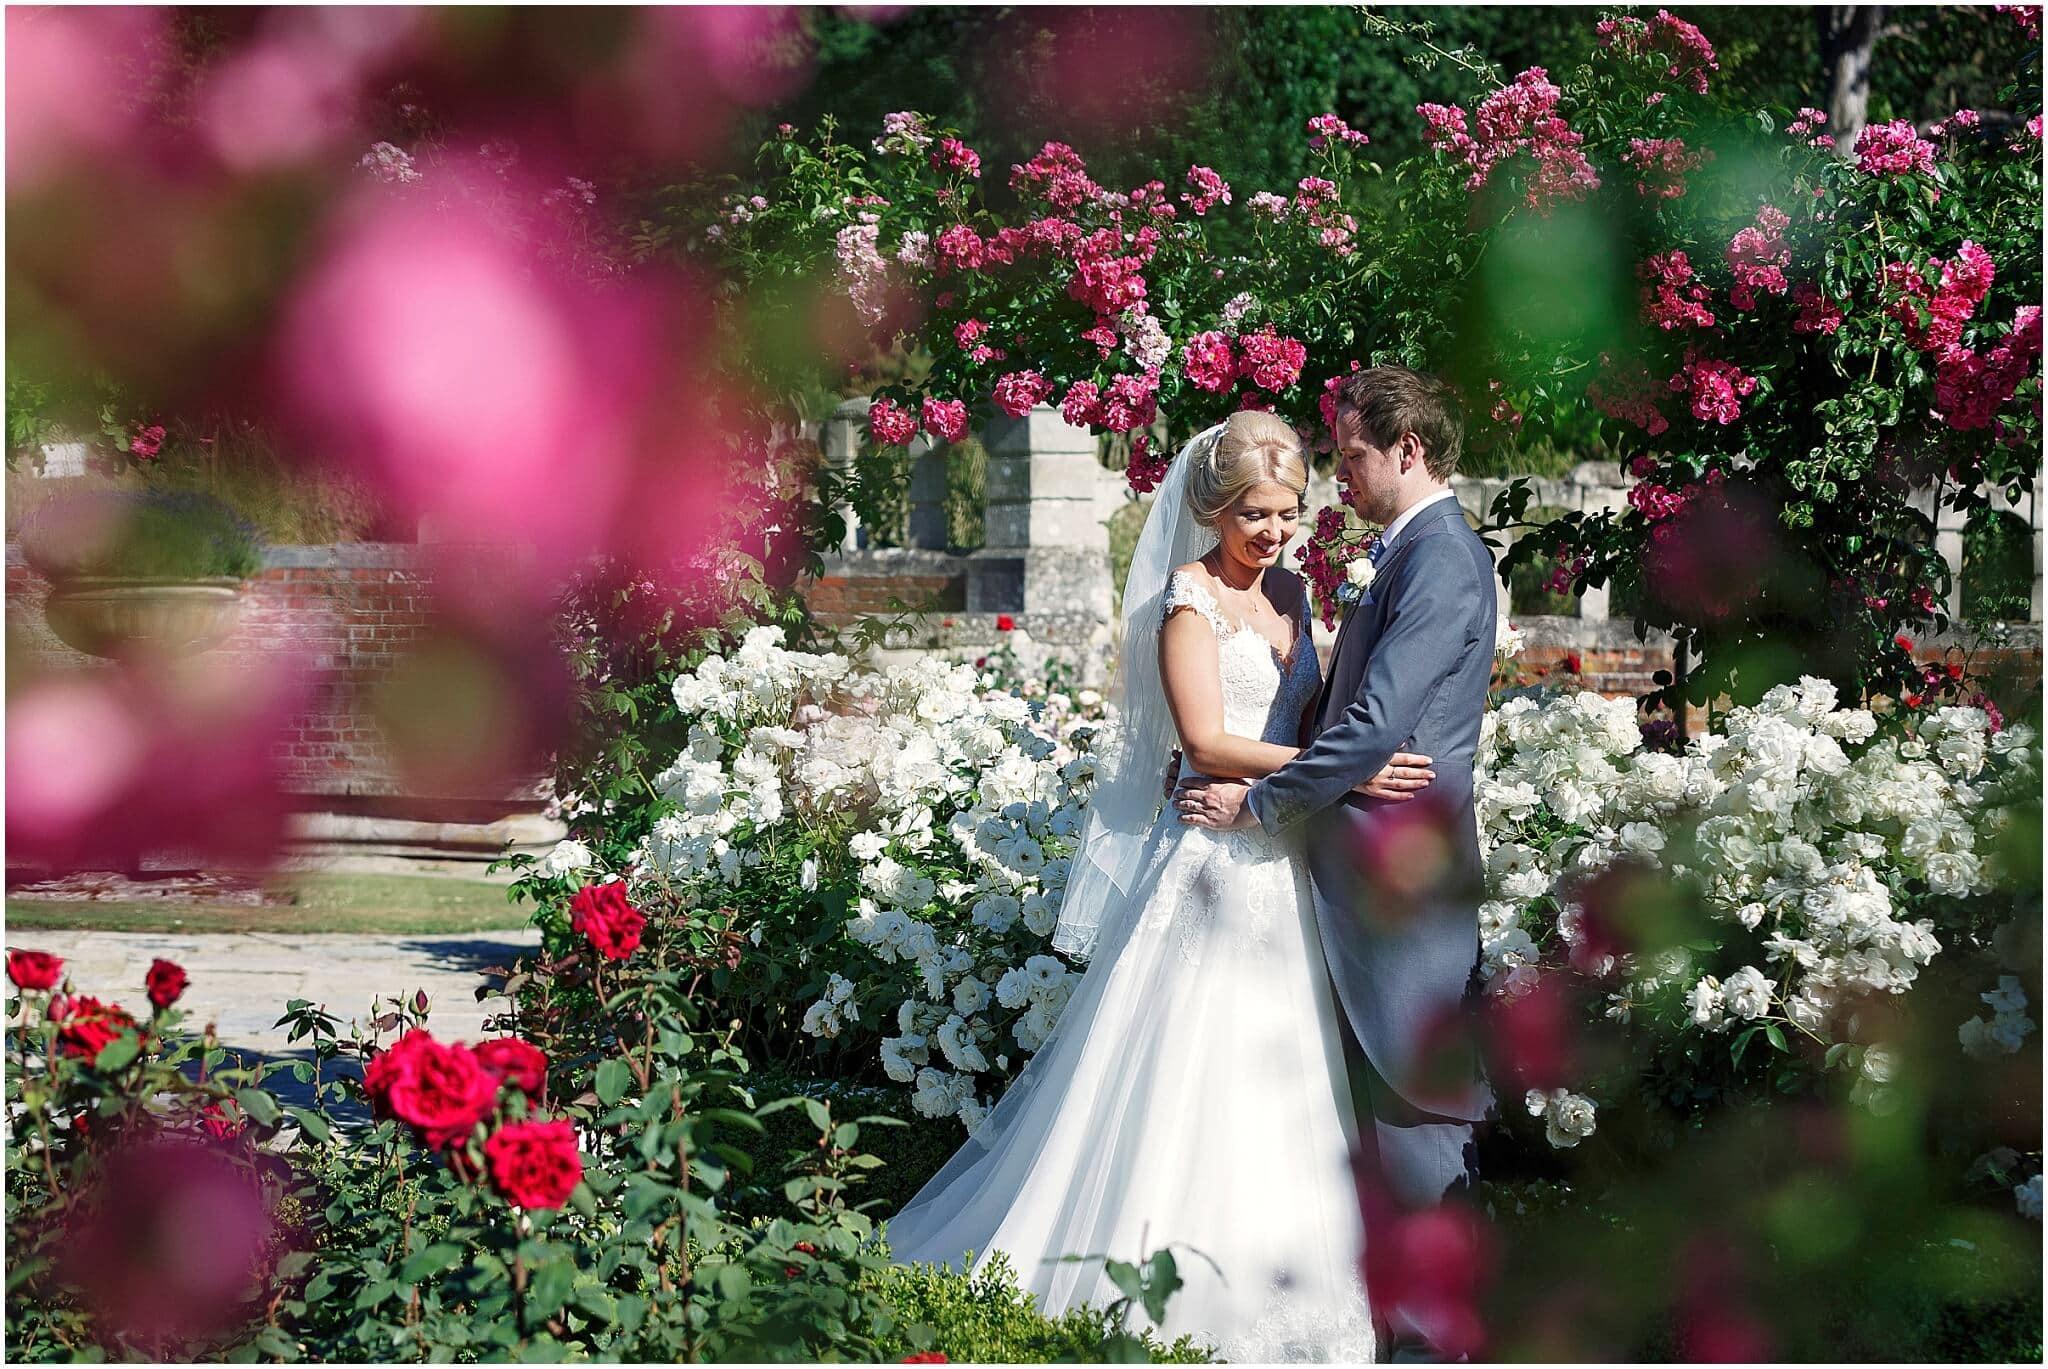 Longstowe Hall rose garden